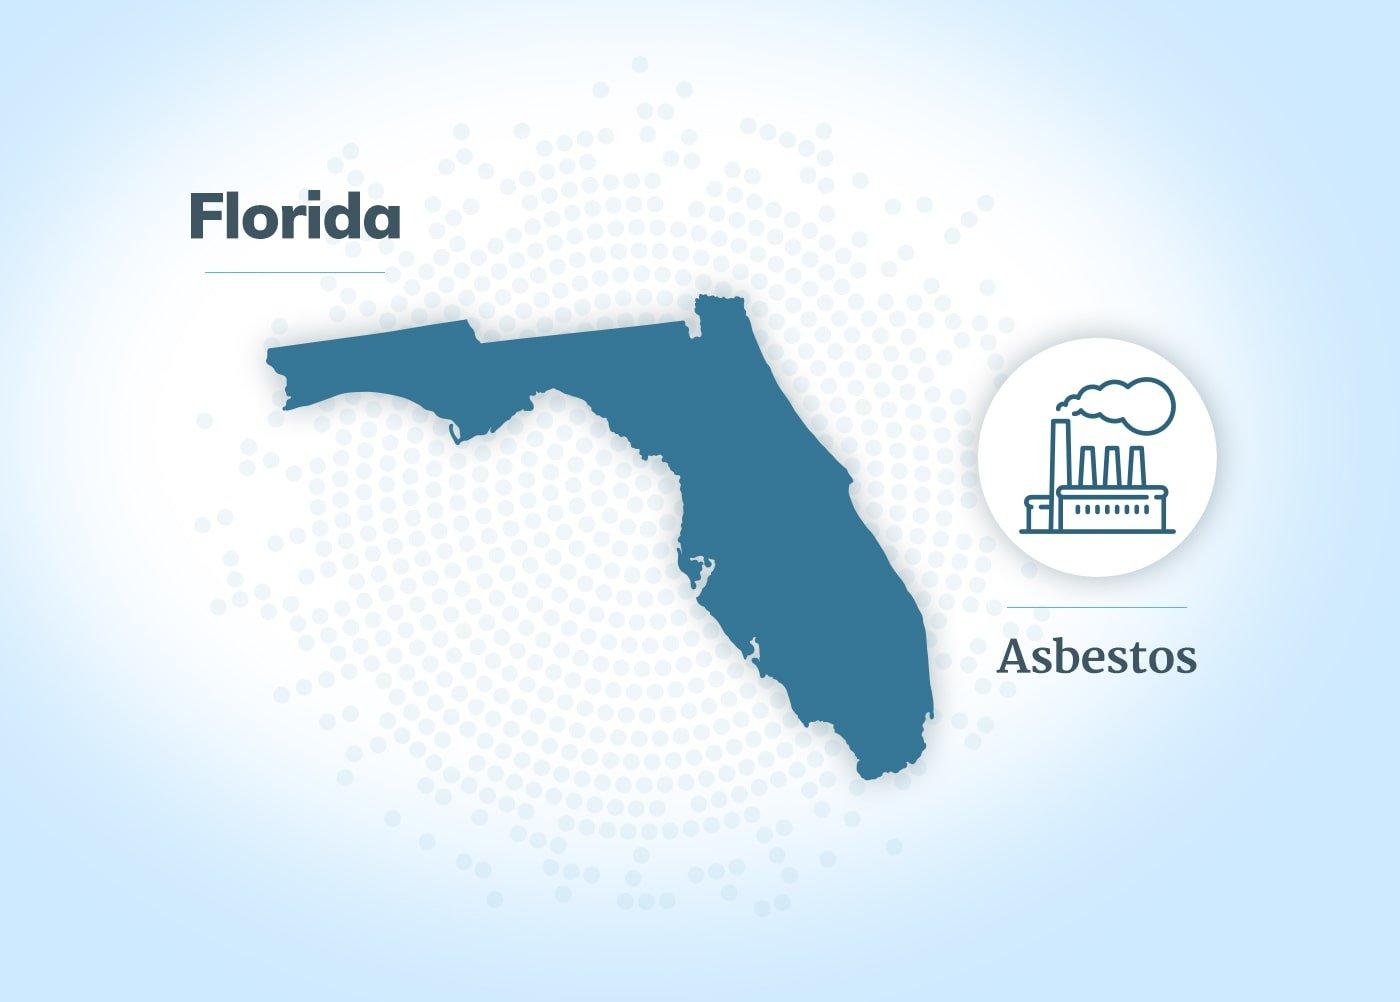 Asbestos exposure in Florida